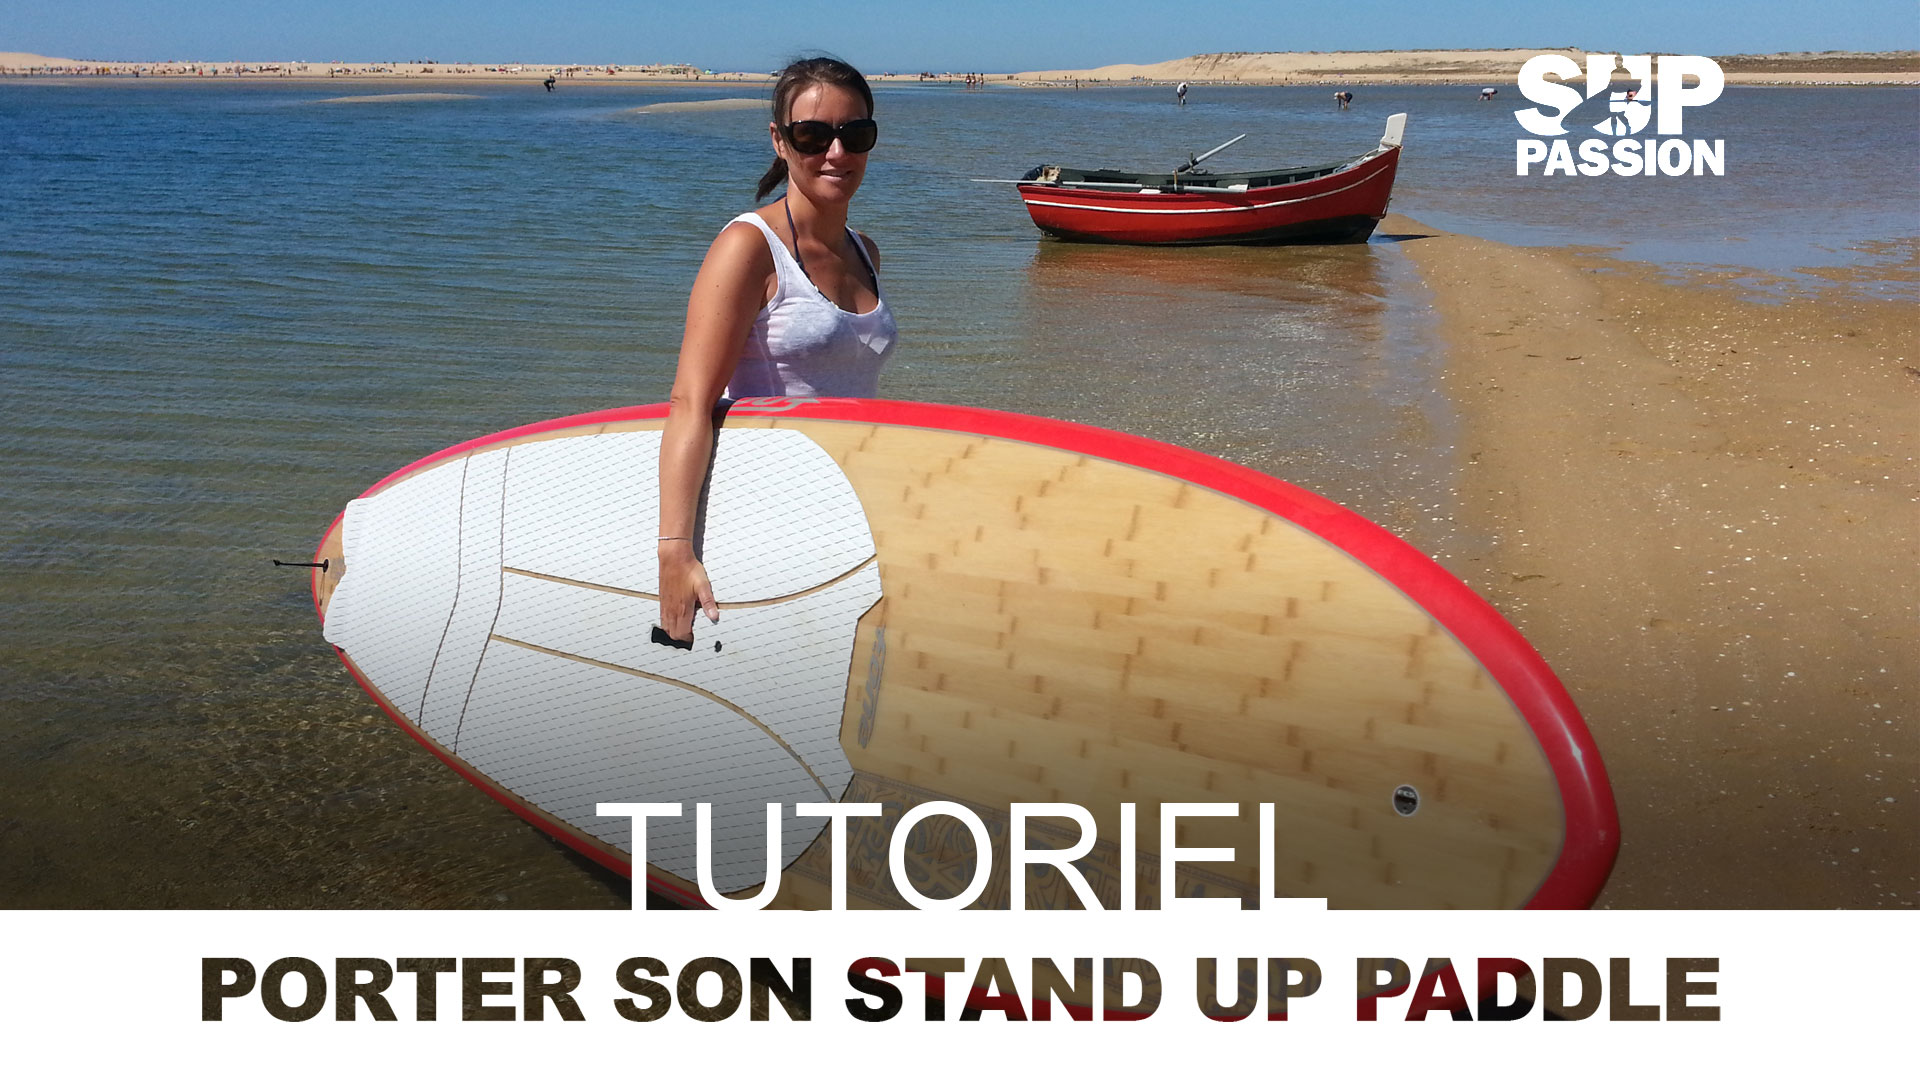 Comment on porte sa planche de stand up paddle ?